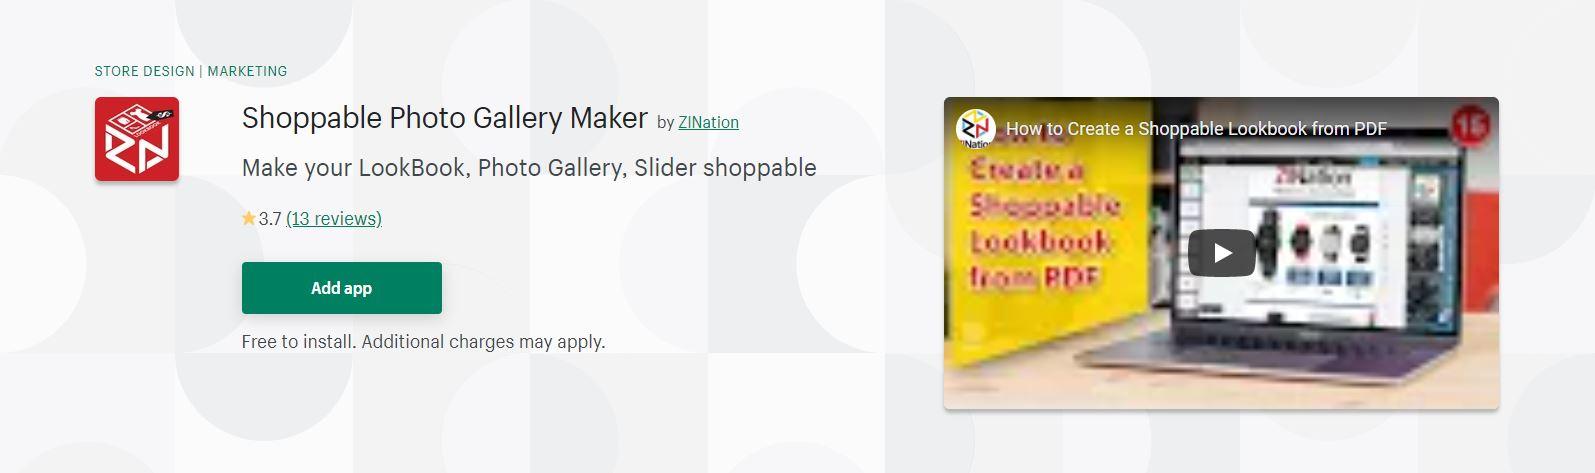 Shoppable Photo Gallery Maker